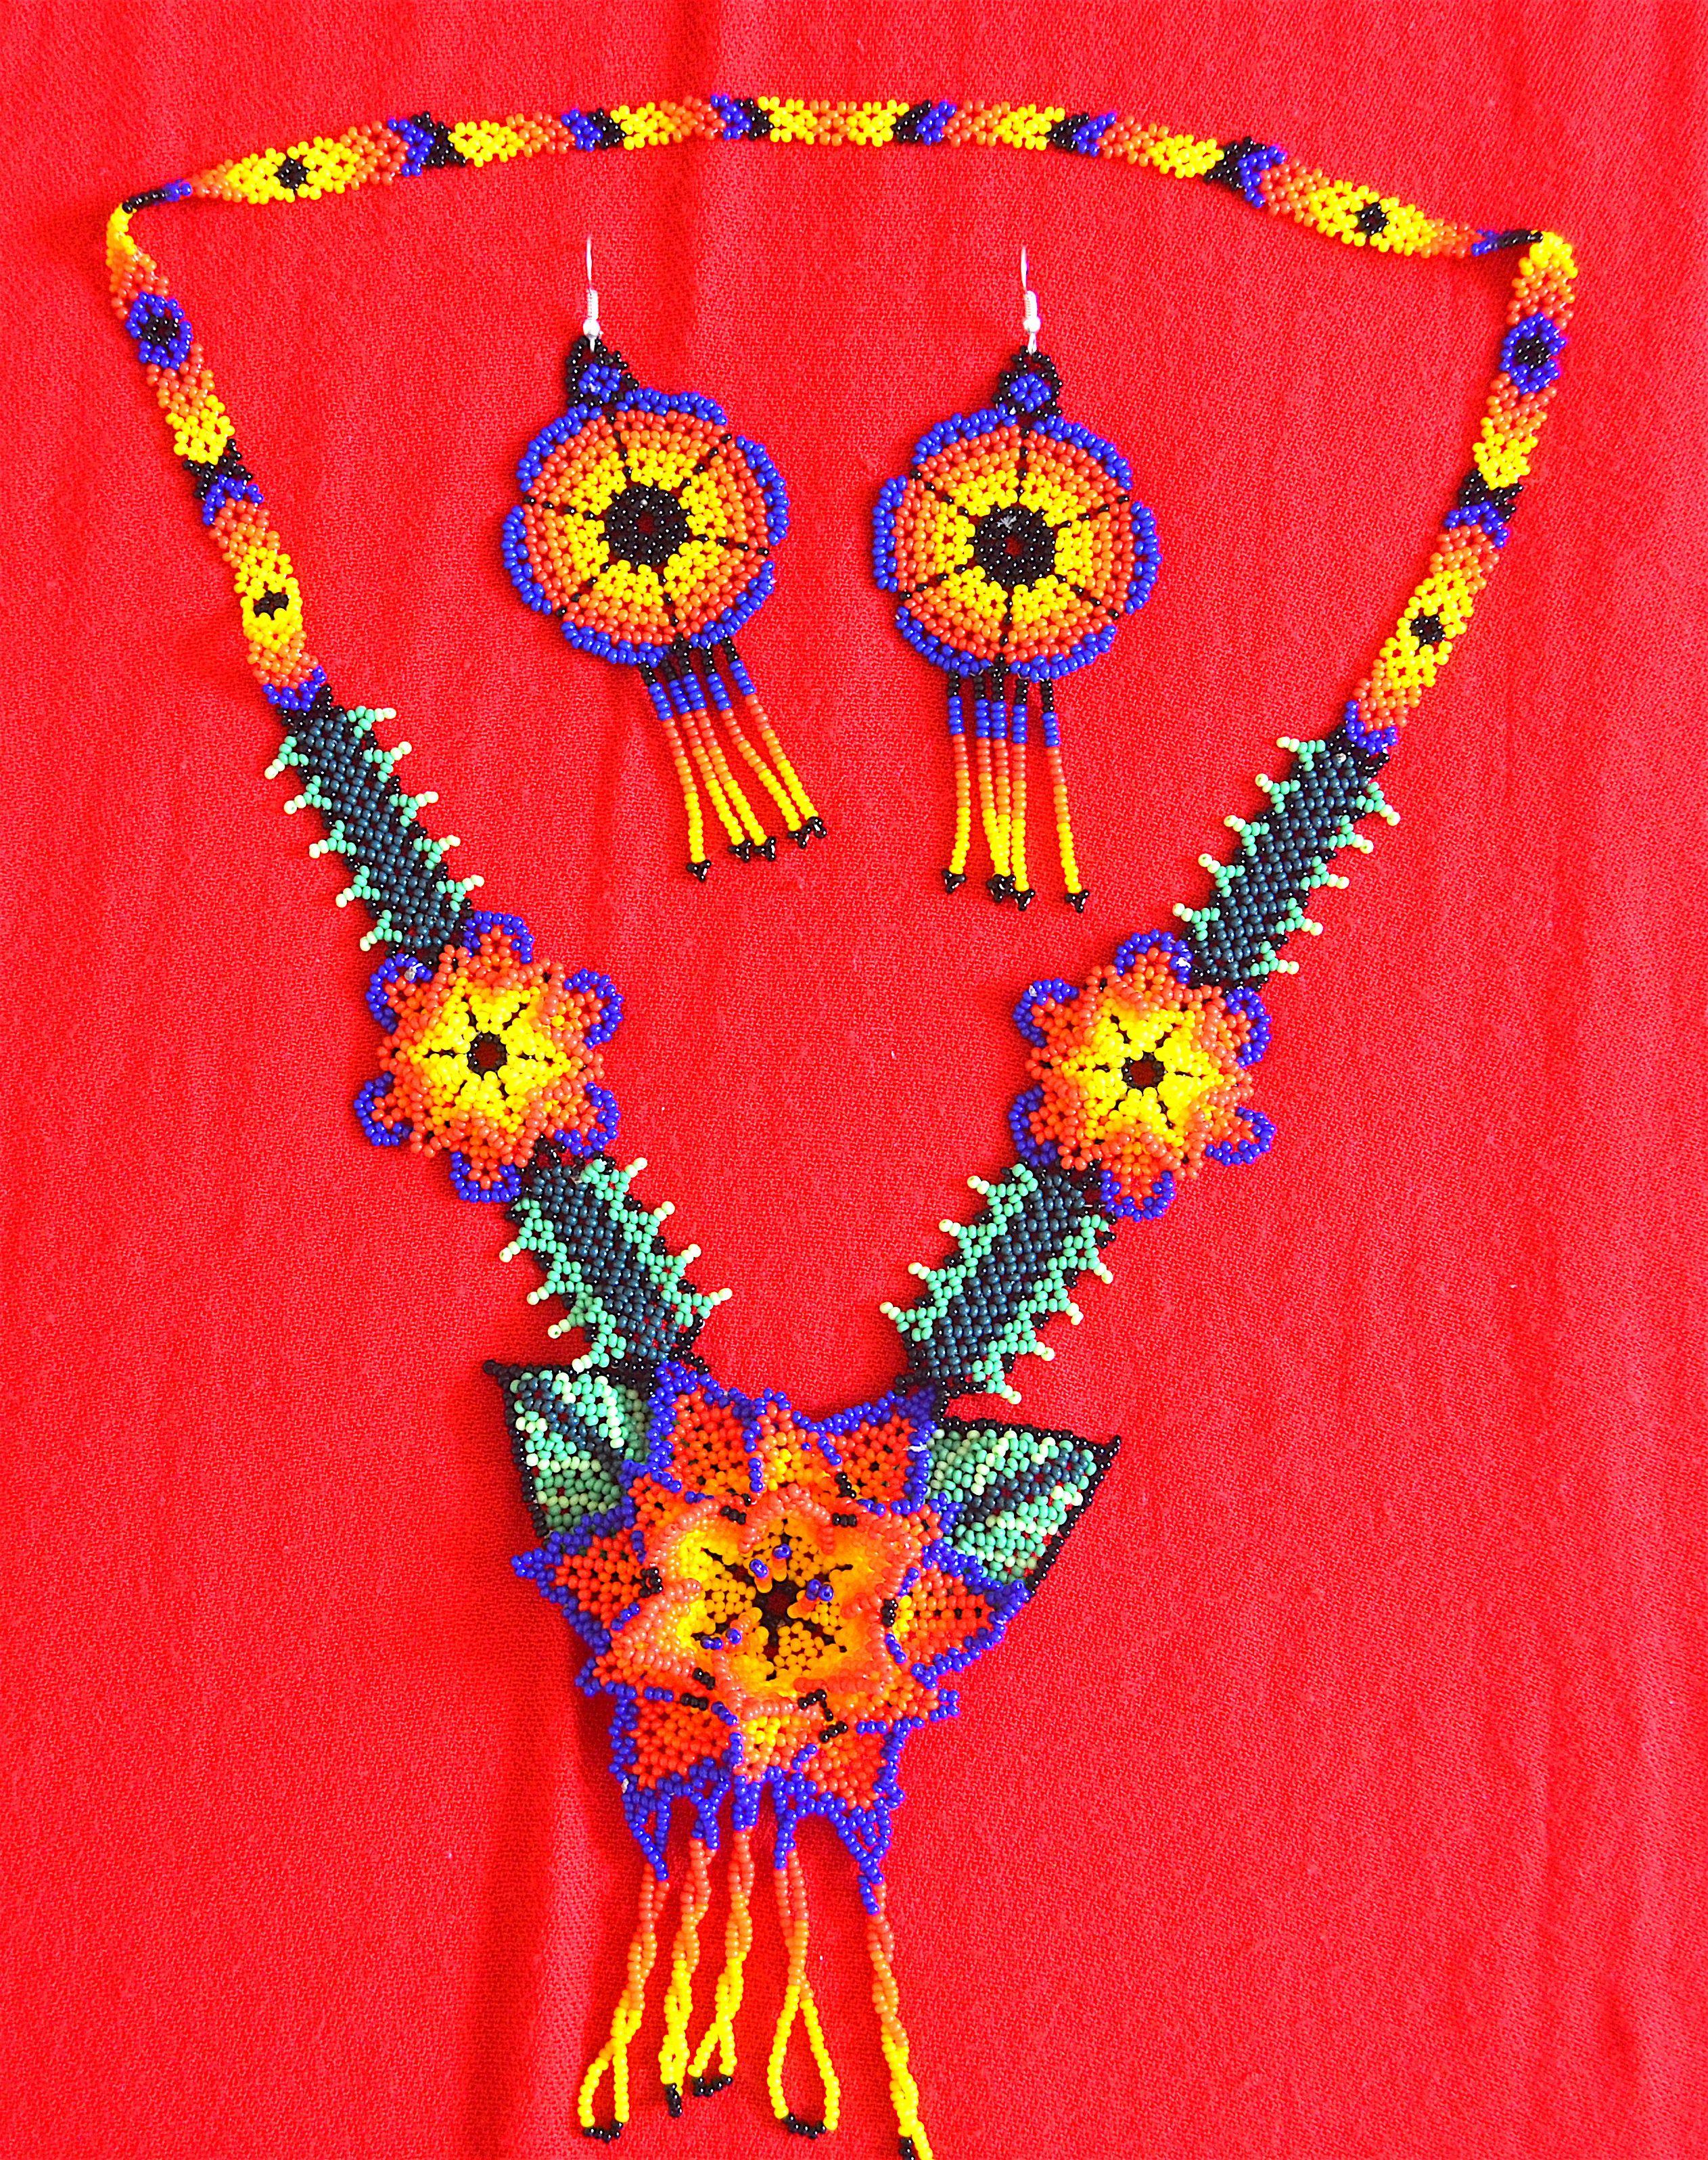 17e70ca90db4 Collar y aretes artesanales con material en chaquira